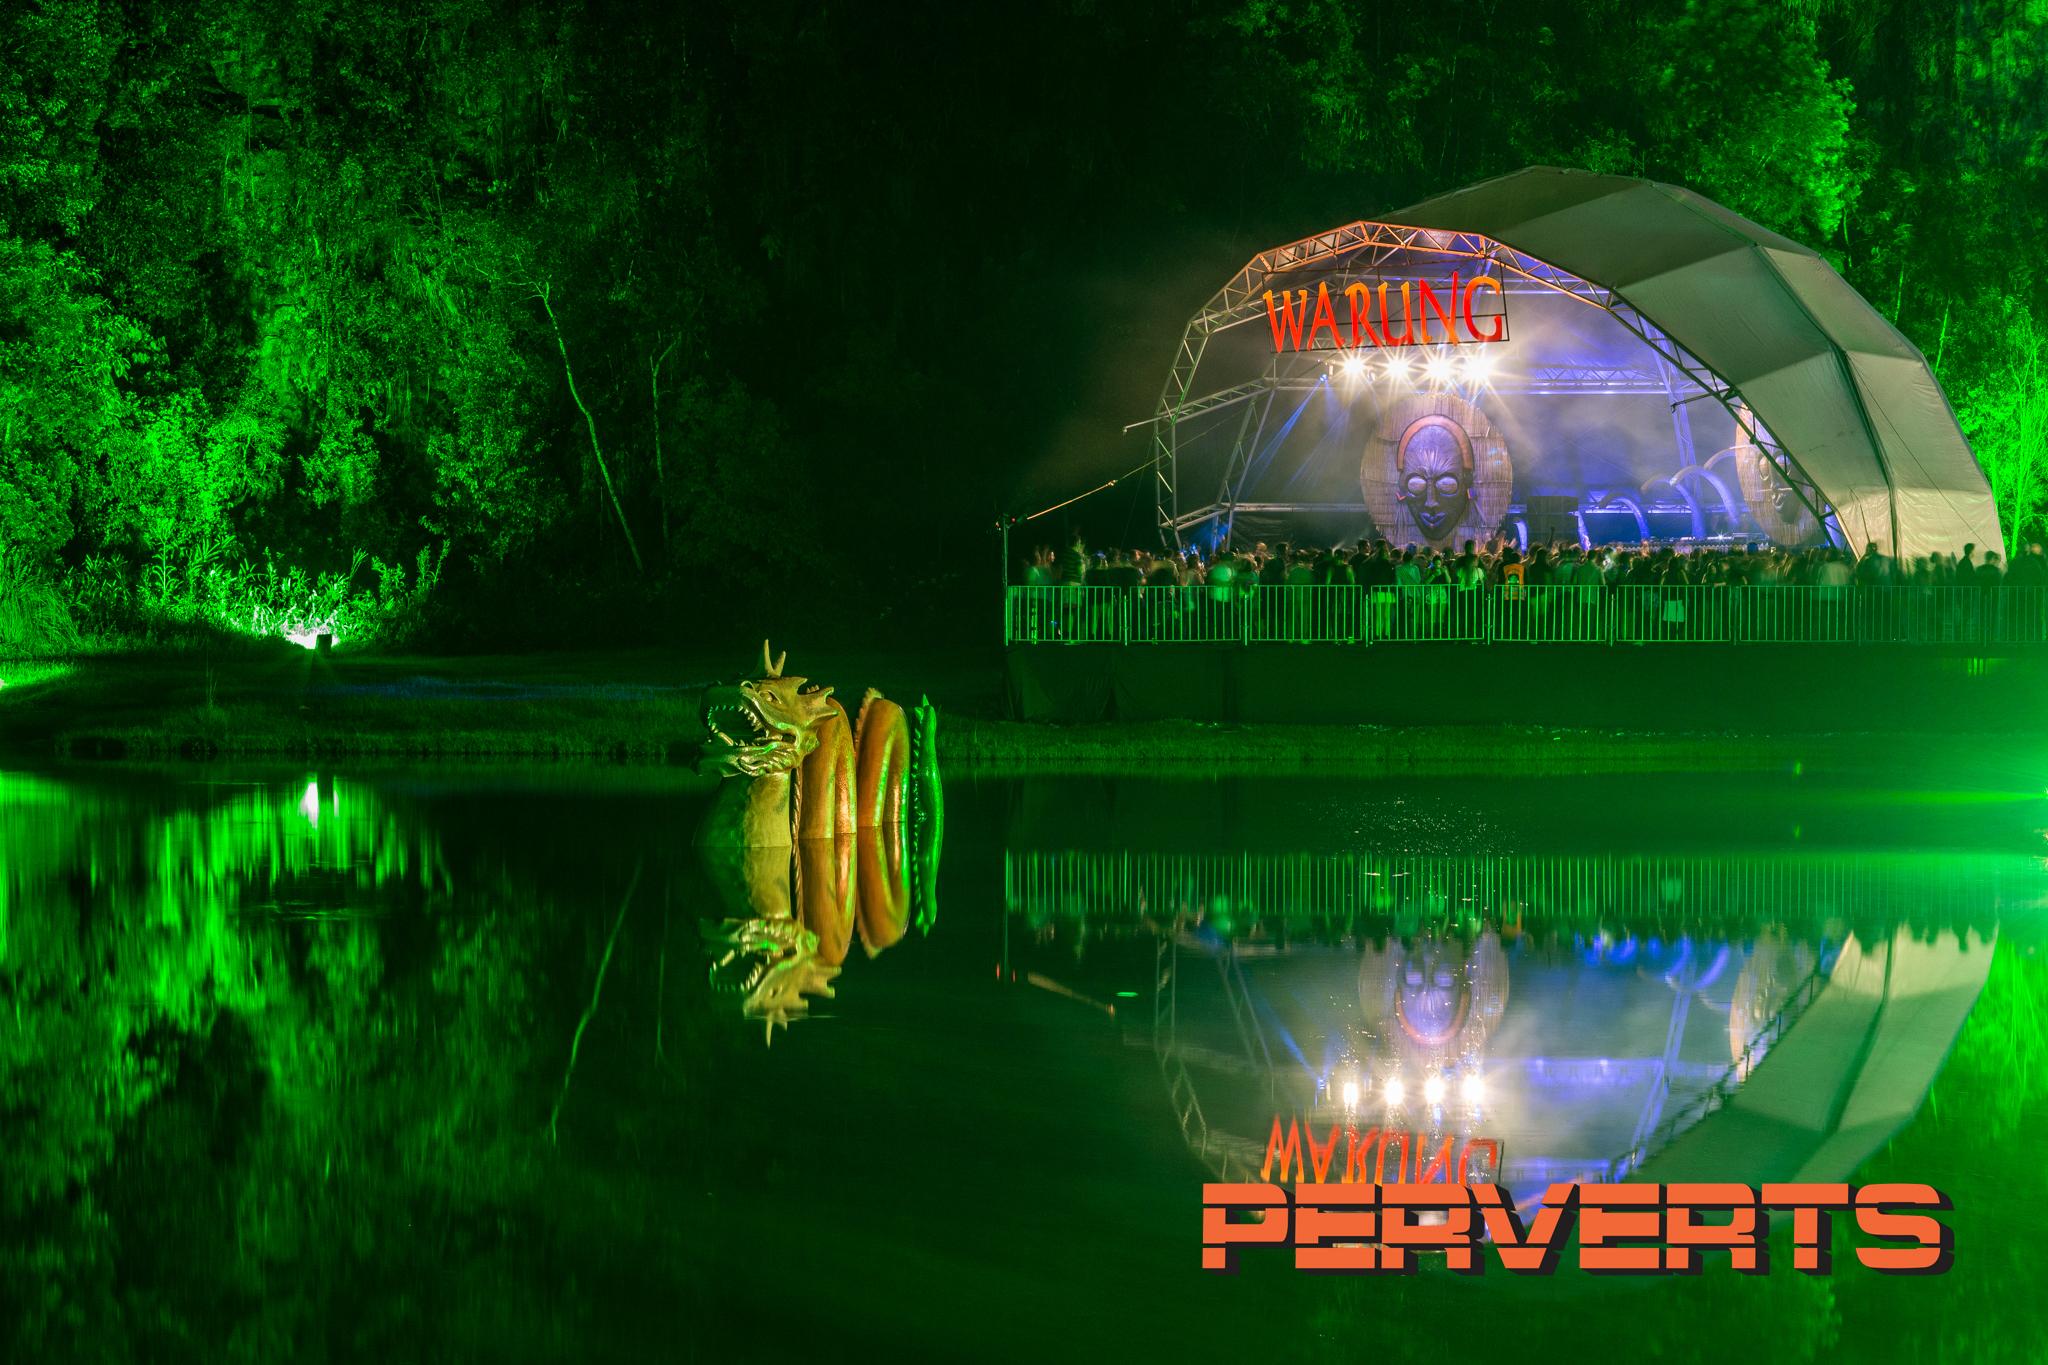 Warung Day Festival . 21 de março de 2015, na Pedreira Paulo Leminski. . cenografia: Perverts. fotografia © Rubens Nemitz Jr